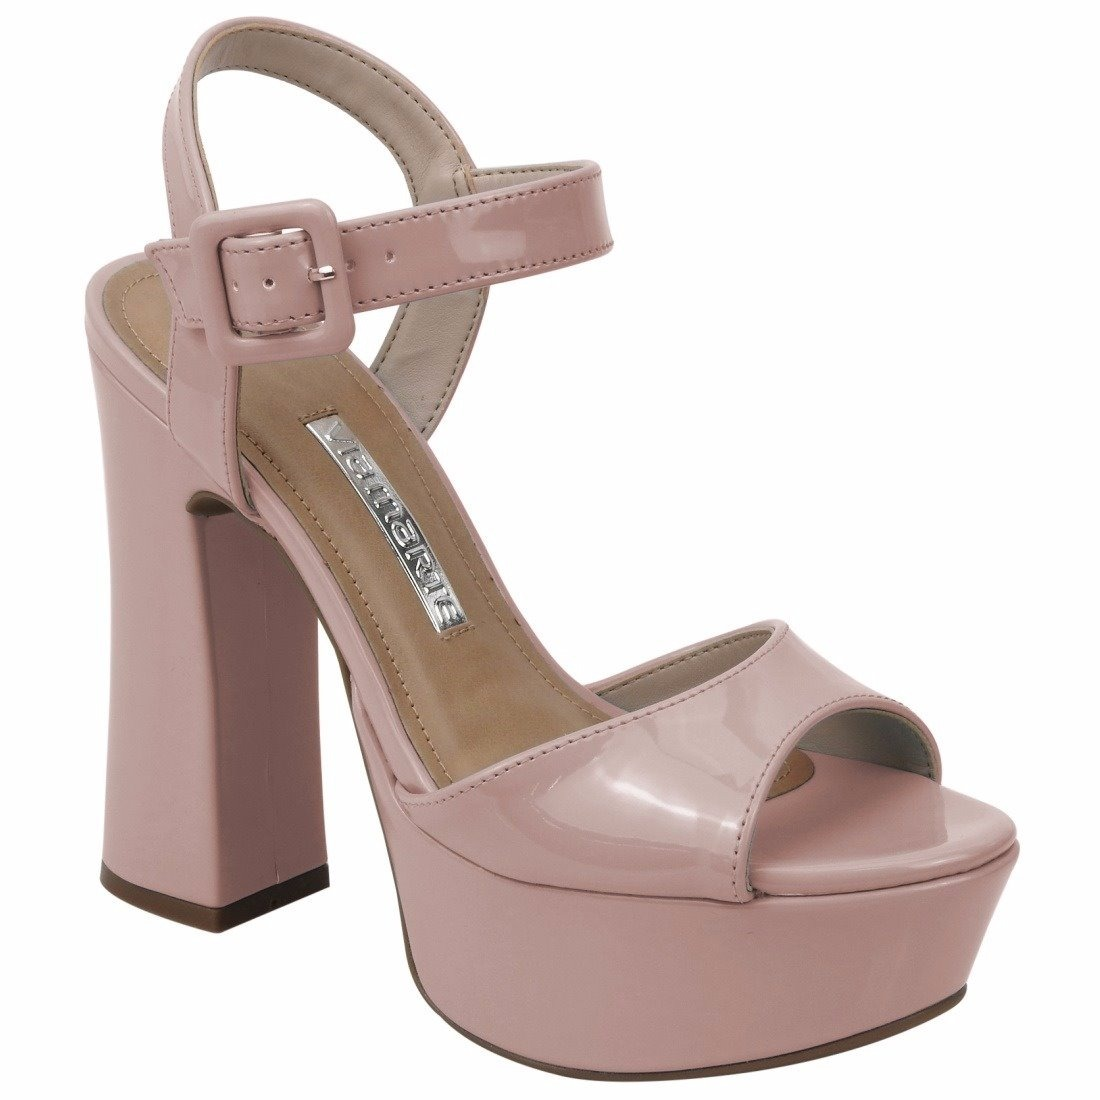 0610ebda5d sandália feminina meia pata cor pele nude via marte 17-11204. Carregando  zoom.